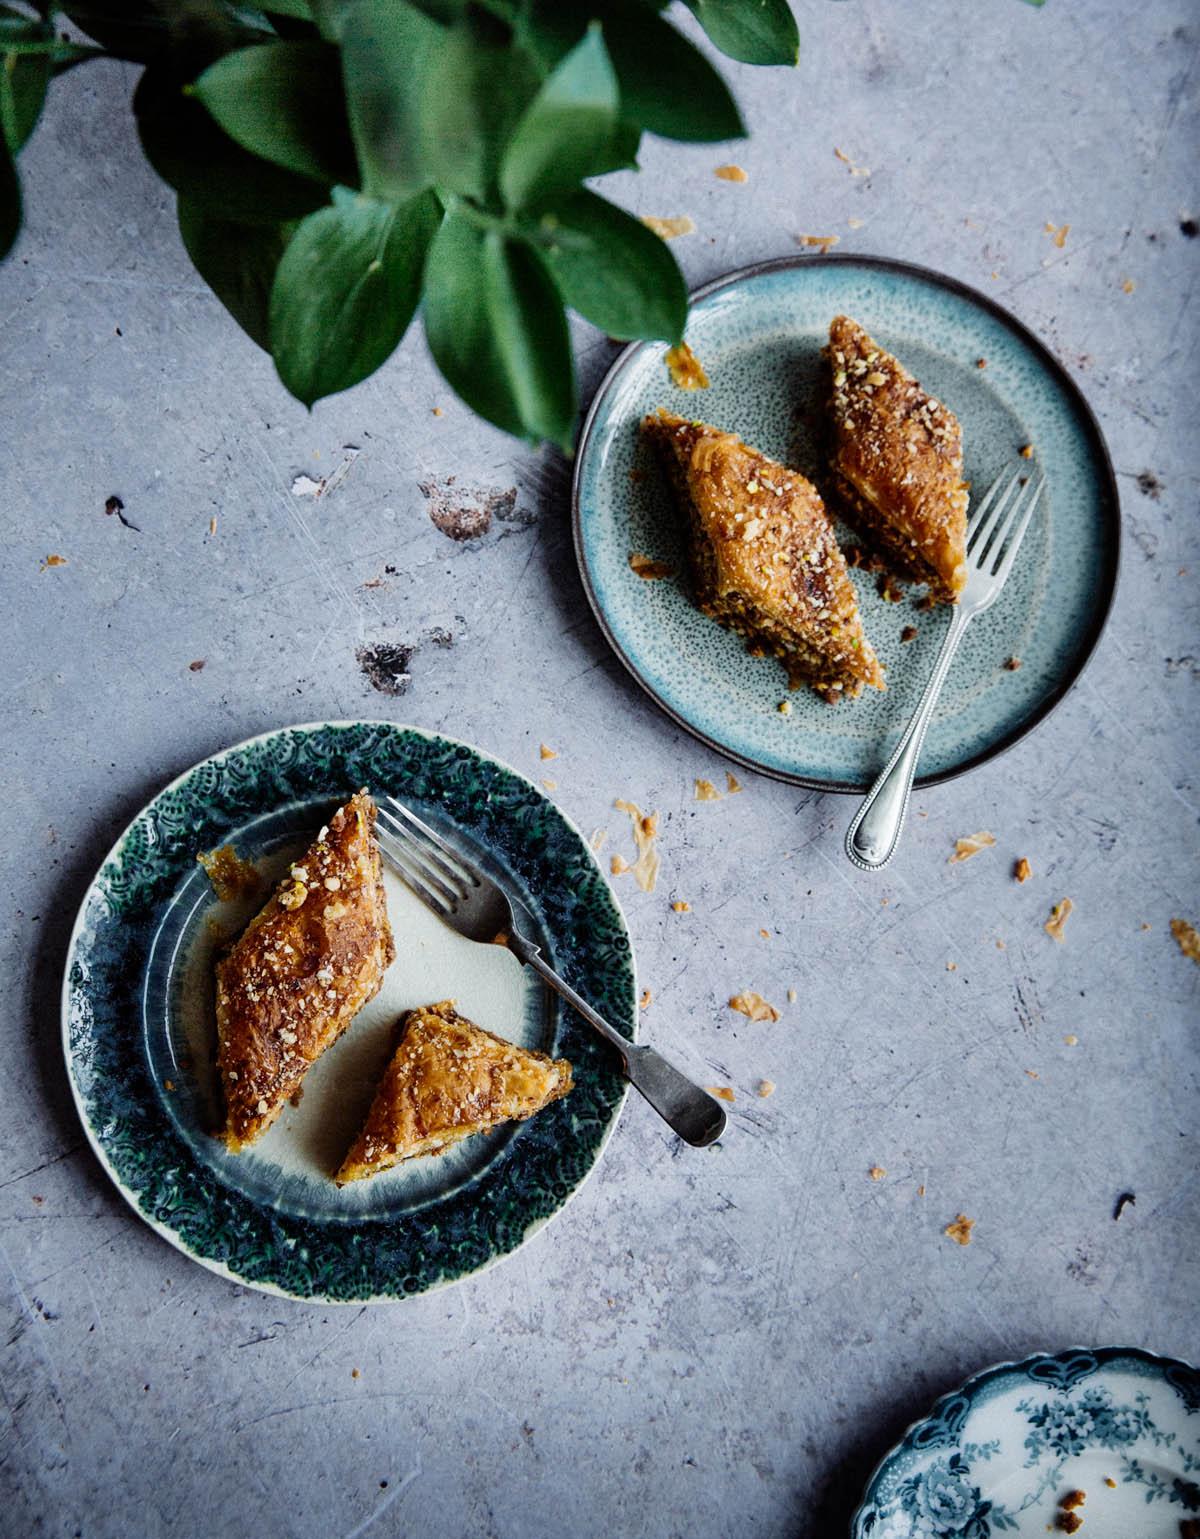 Nutty & crunchy baklava